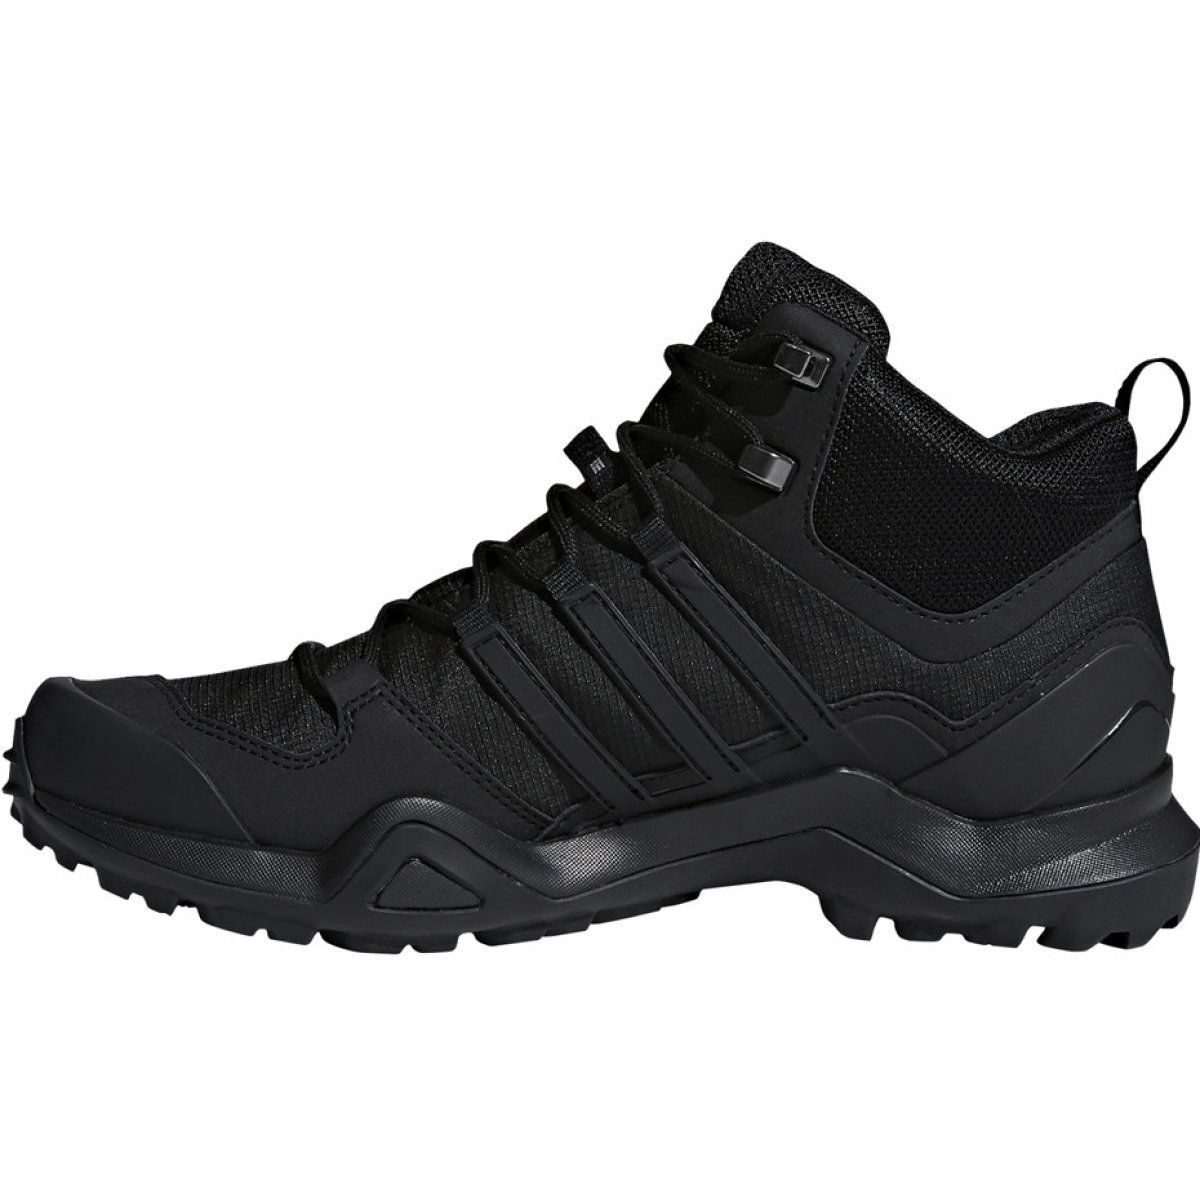 Buty Adidas Terrex Swift R2 Mid Gtx M Cm7500 Czarne Adidas Outfit Shoes Adidas Shoes Outlet Shoes Sneakers Adidas